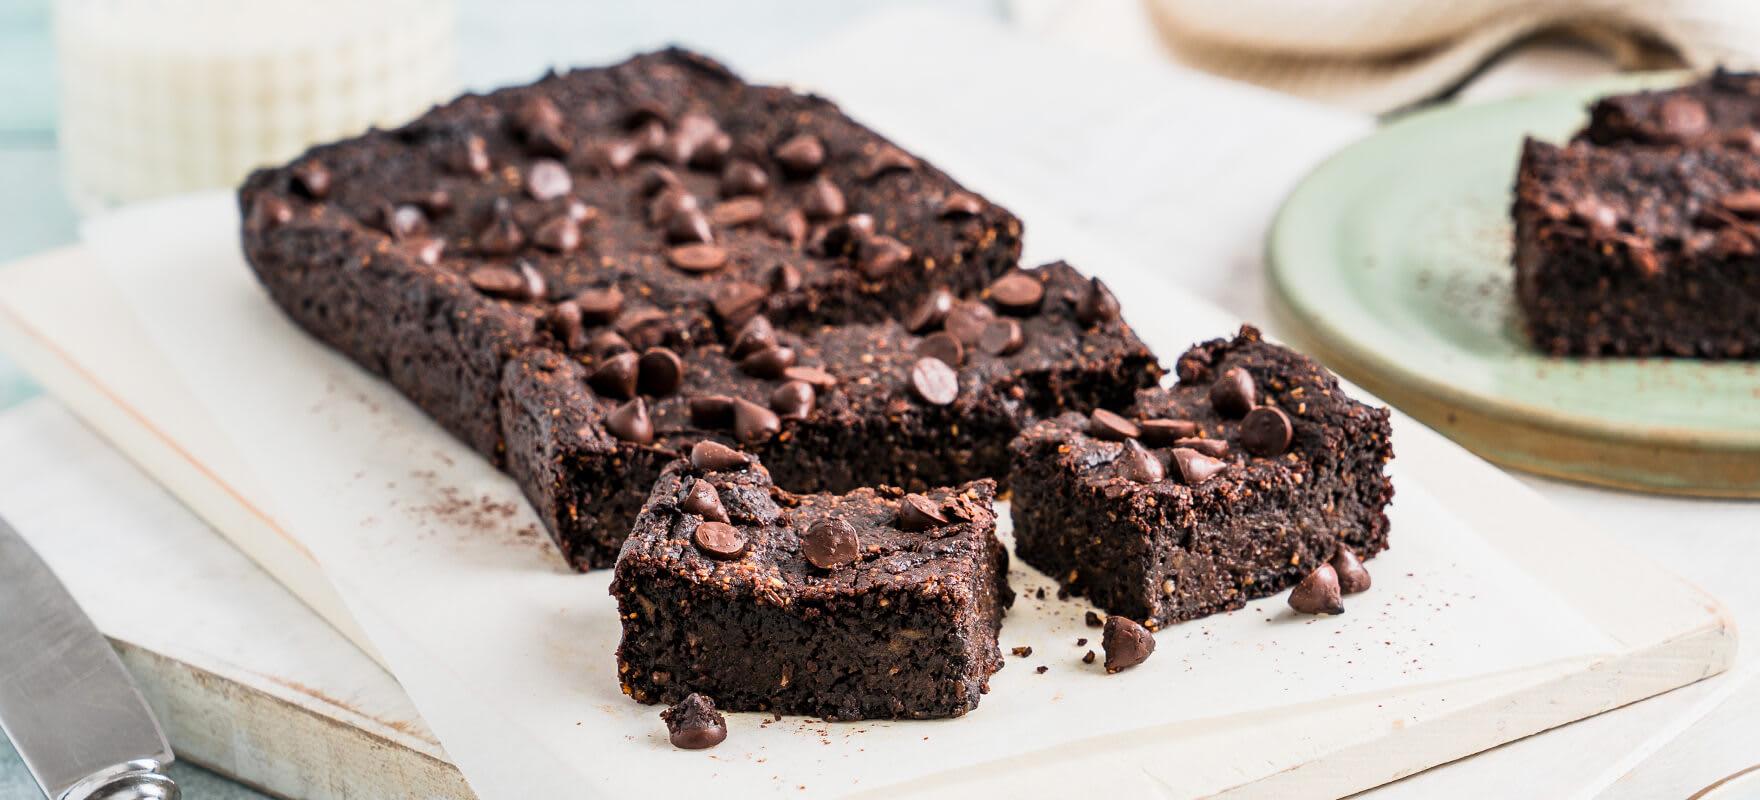 Sweet potato brownies image 1